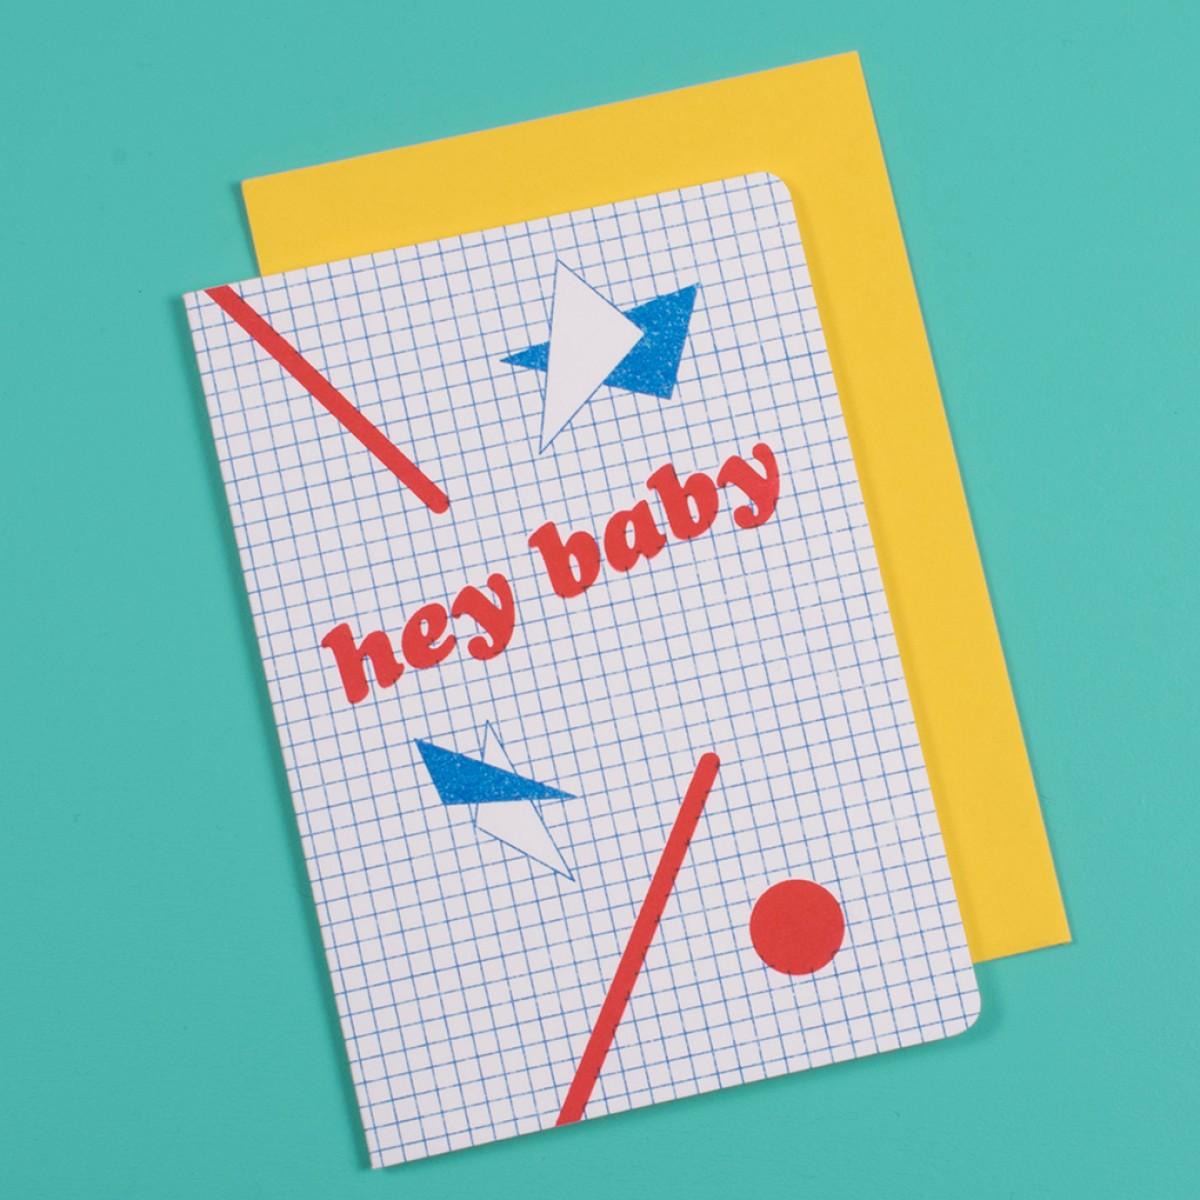 polypodium / hey baby - Grußkarte - Risoduck